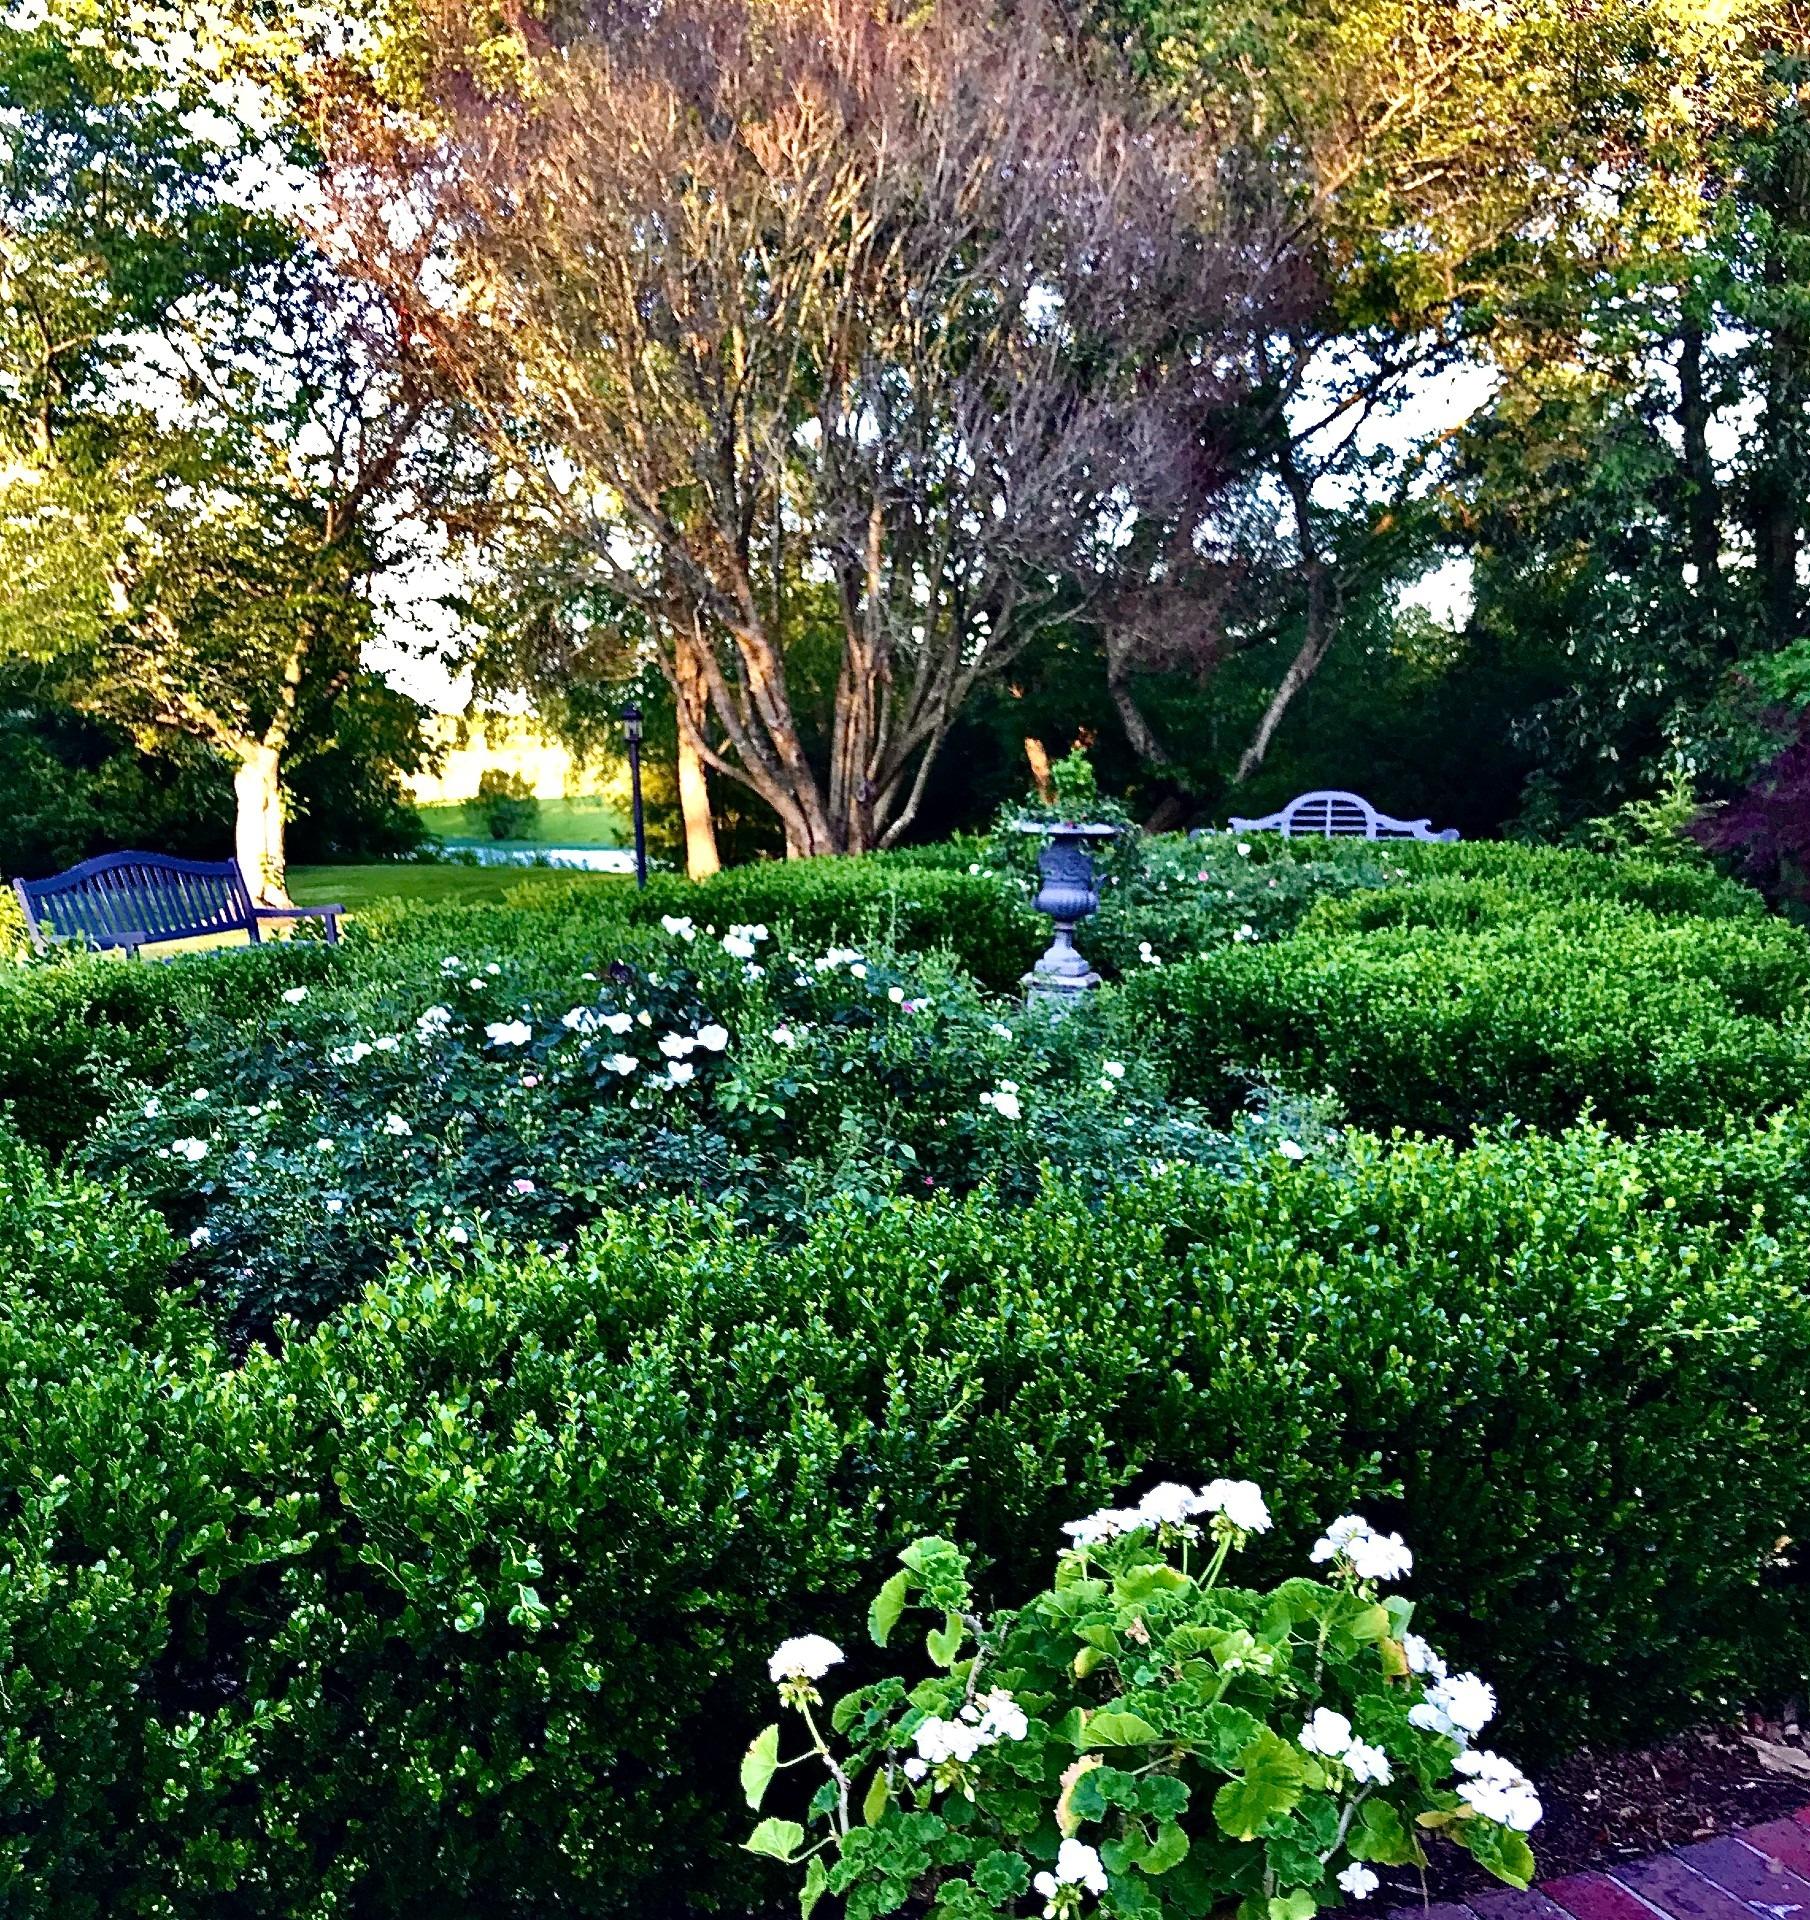 Cottongin-formal garden - Cheryl Orr (1)